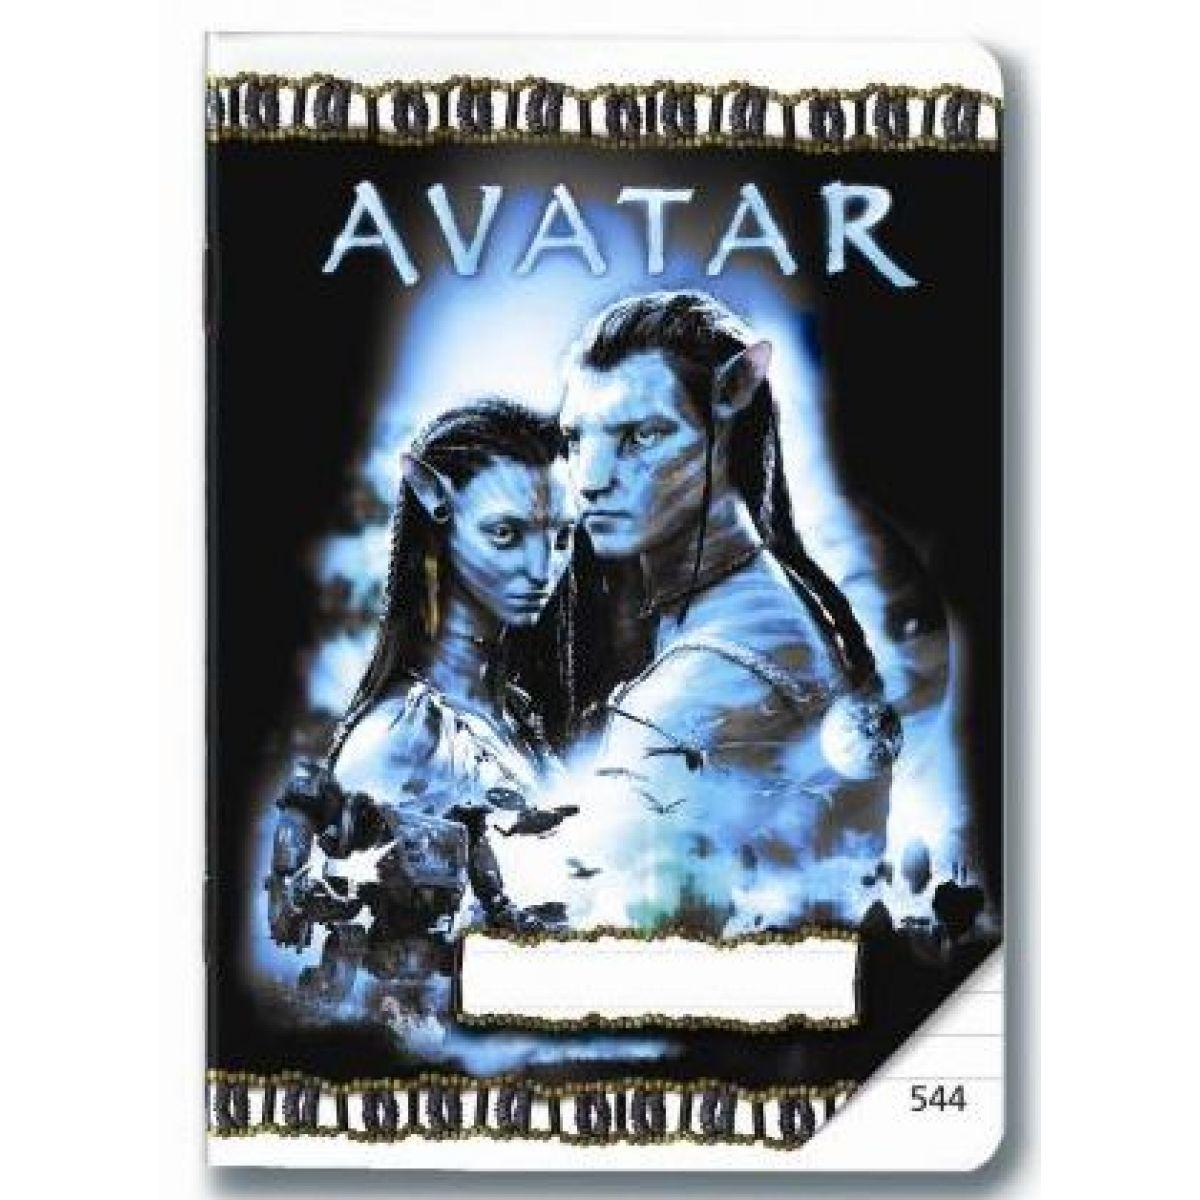 BONAPARTE 03446 - Sešit 544 - Avatar